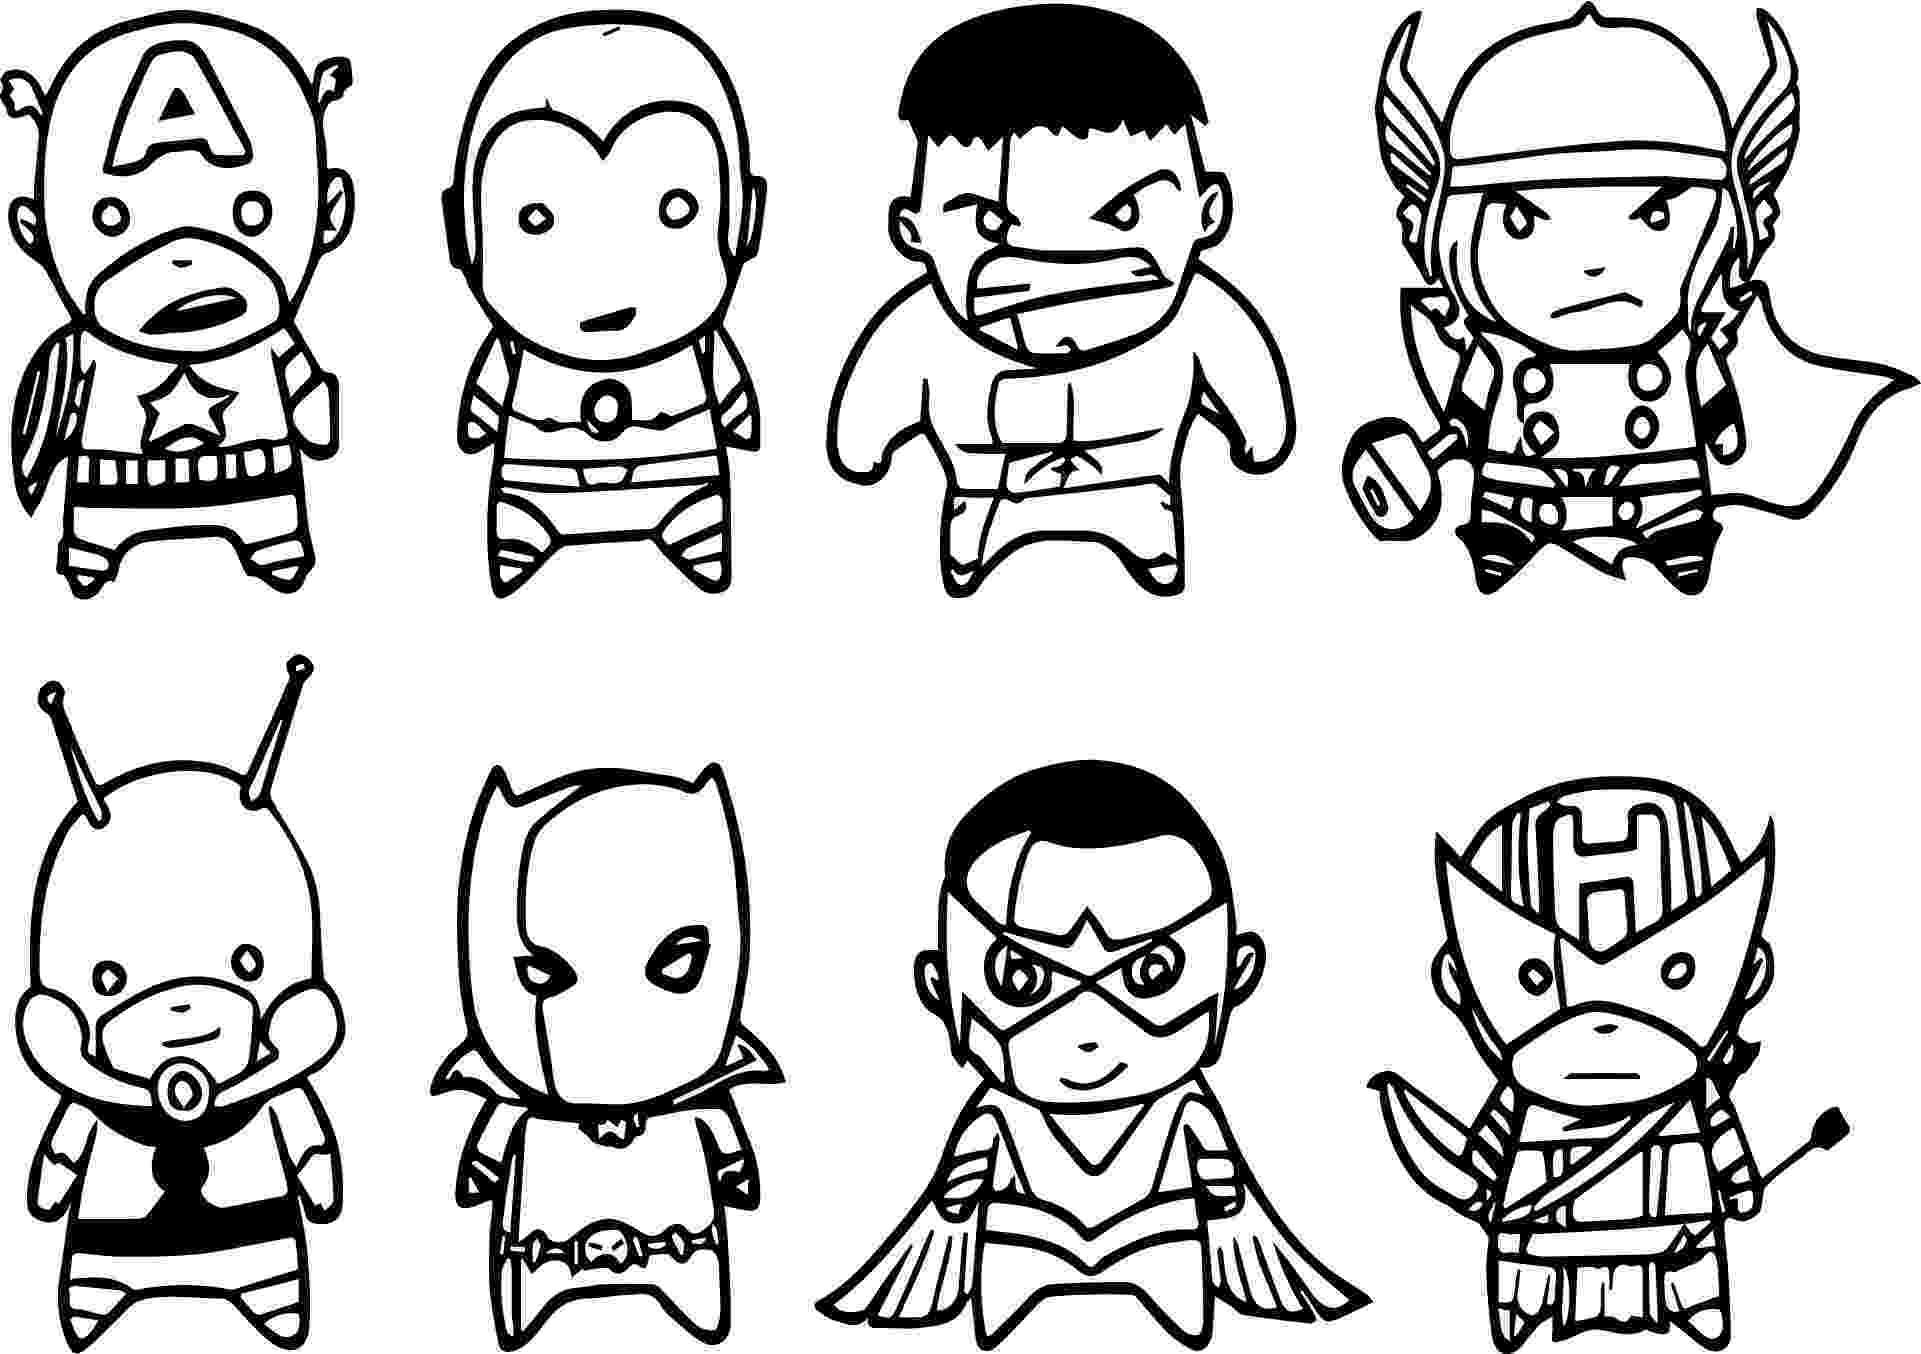 avengers coloring sheet avengers coloring pages print and colorcom sheet avengers coloring